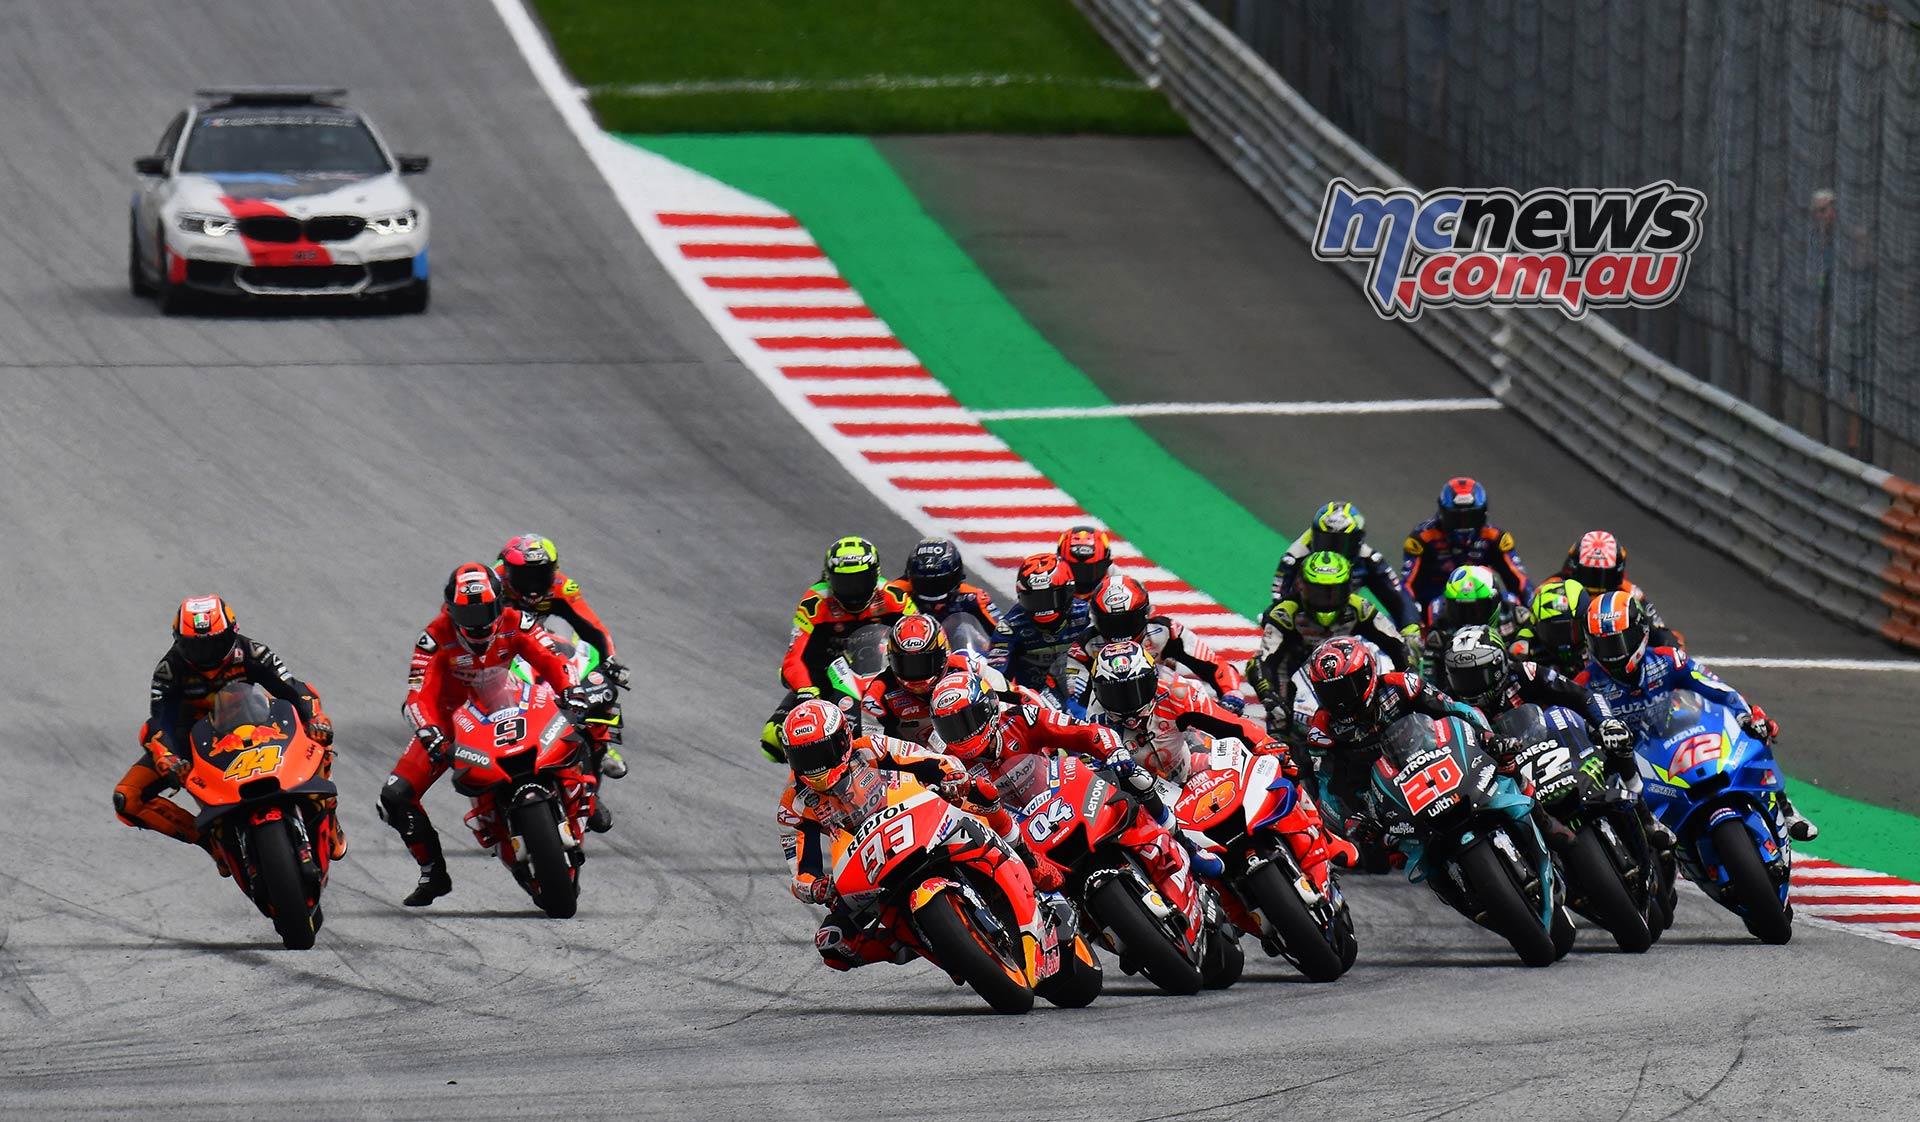 2019-motogp-rnd11-redbullring-race-start.jpg